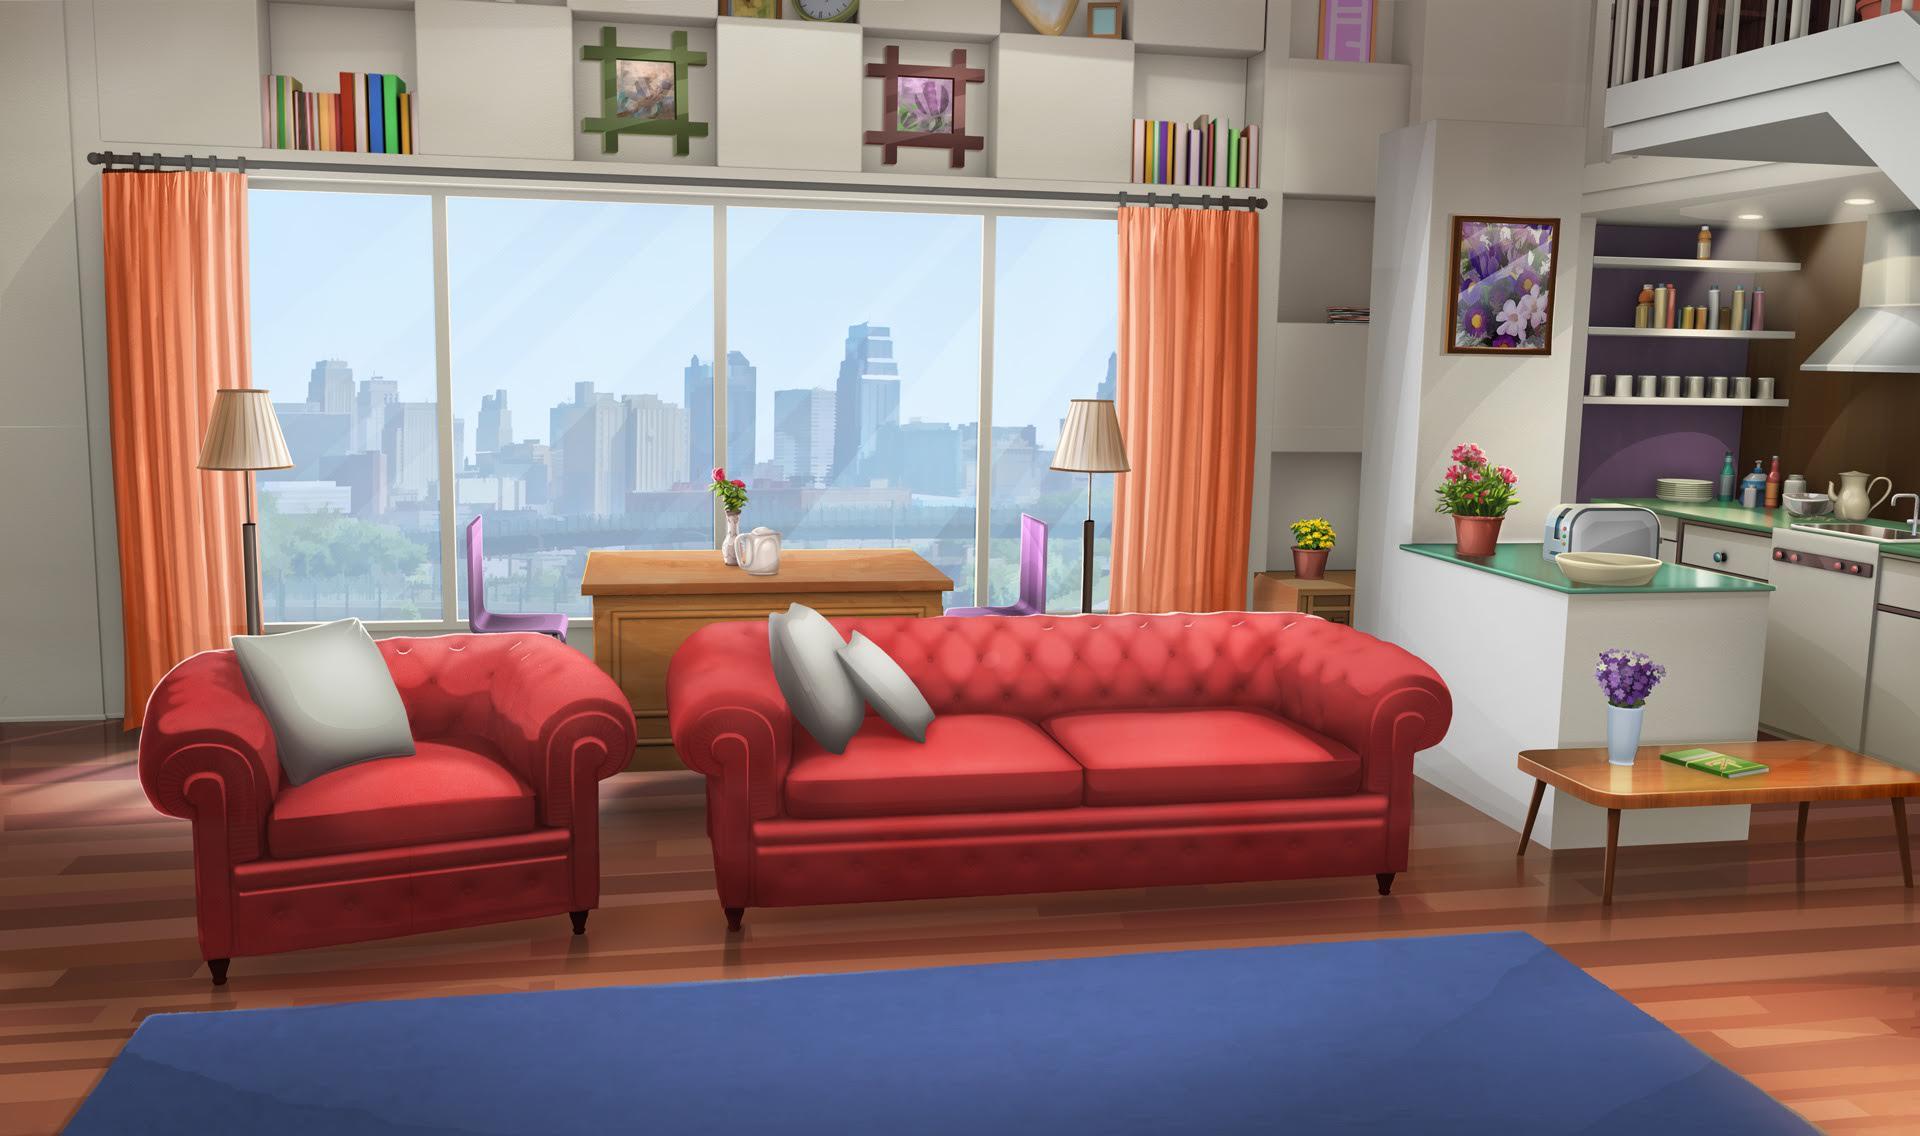 Apartment Living Rooms : Anime Living Room Background  www.pixshark.com - Images ...